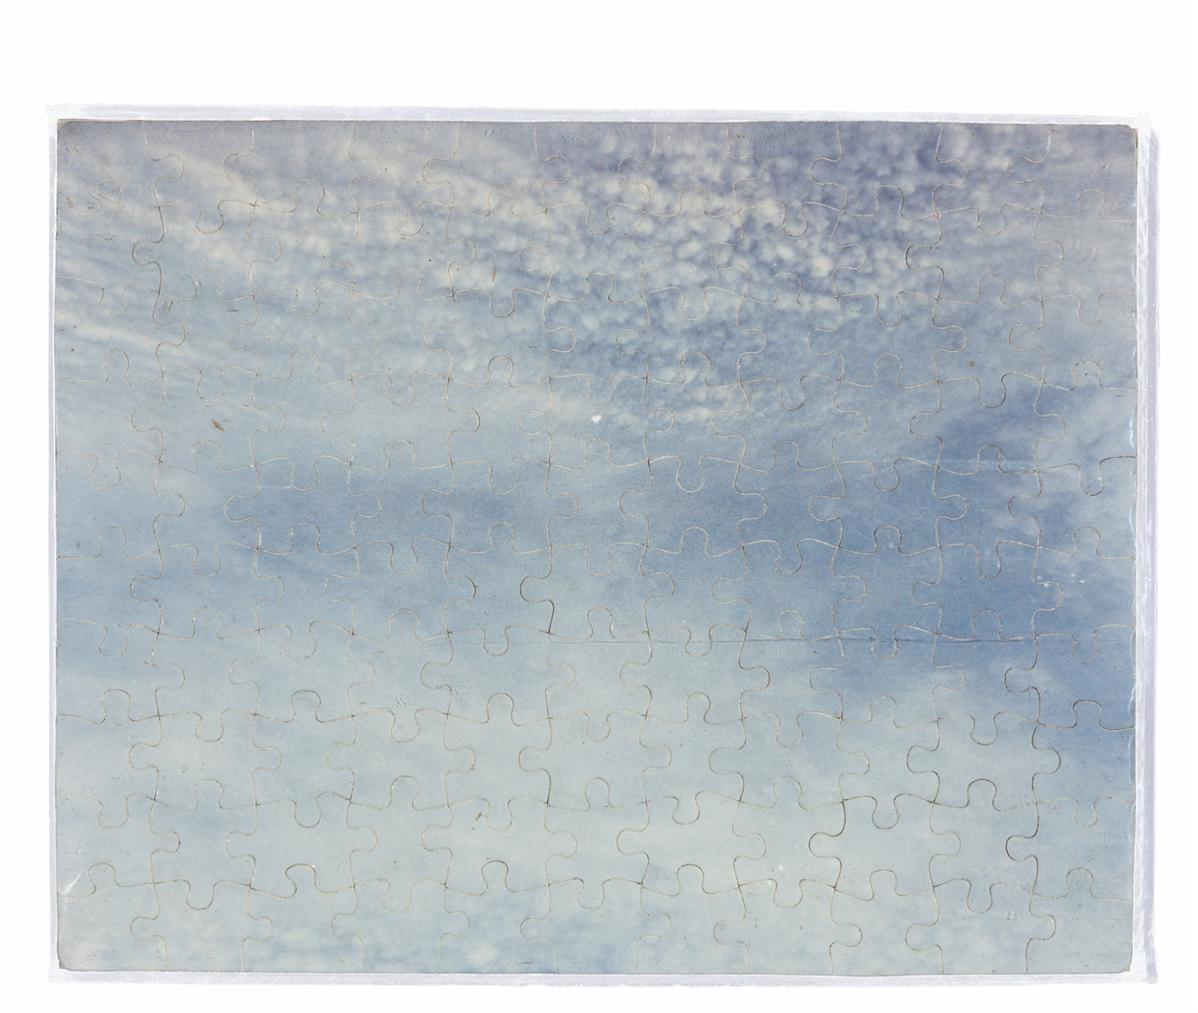 Felix Gonzalez-Torres-'Untitled' (For White Columns)-1990